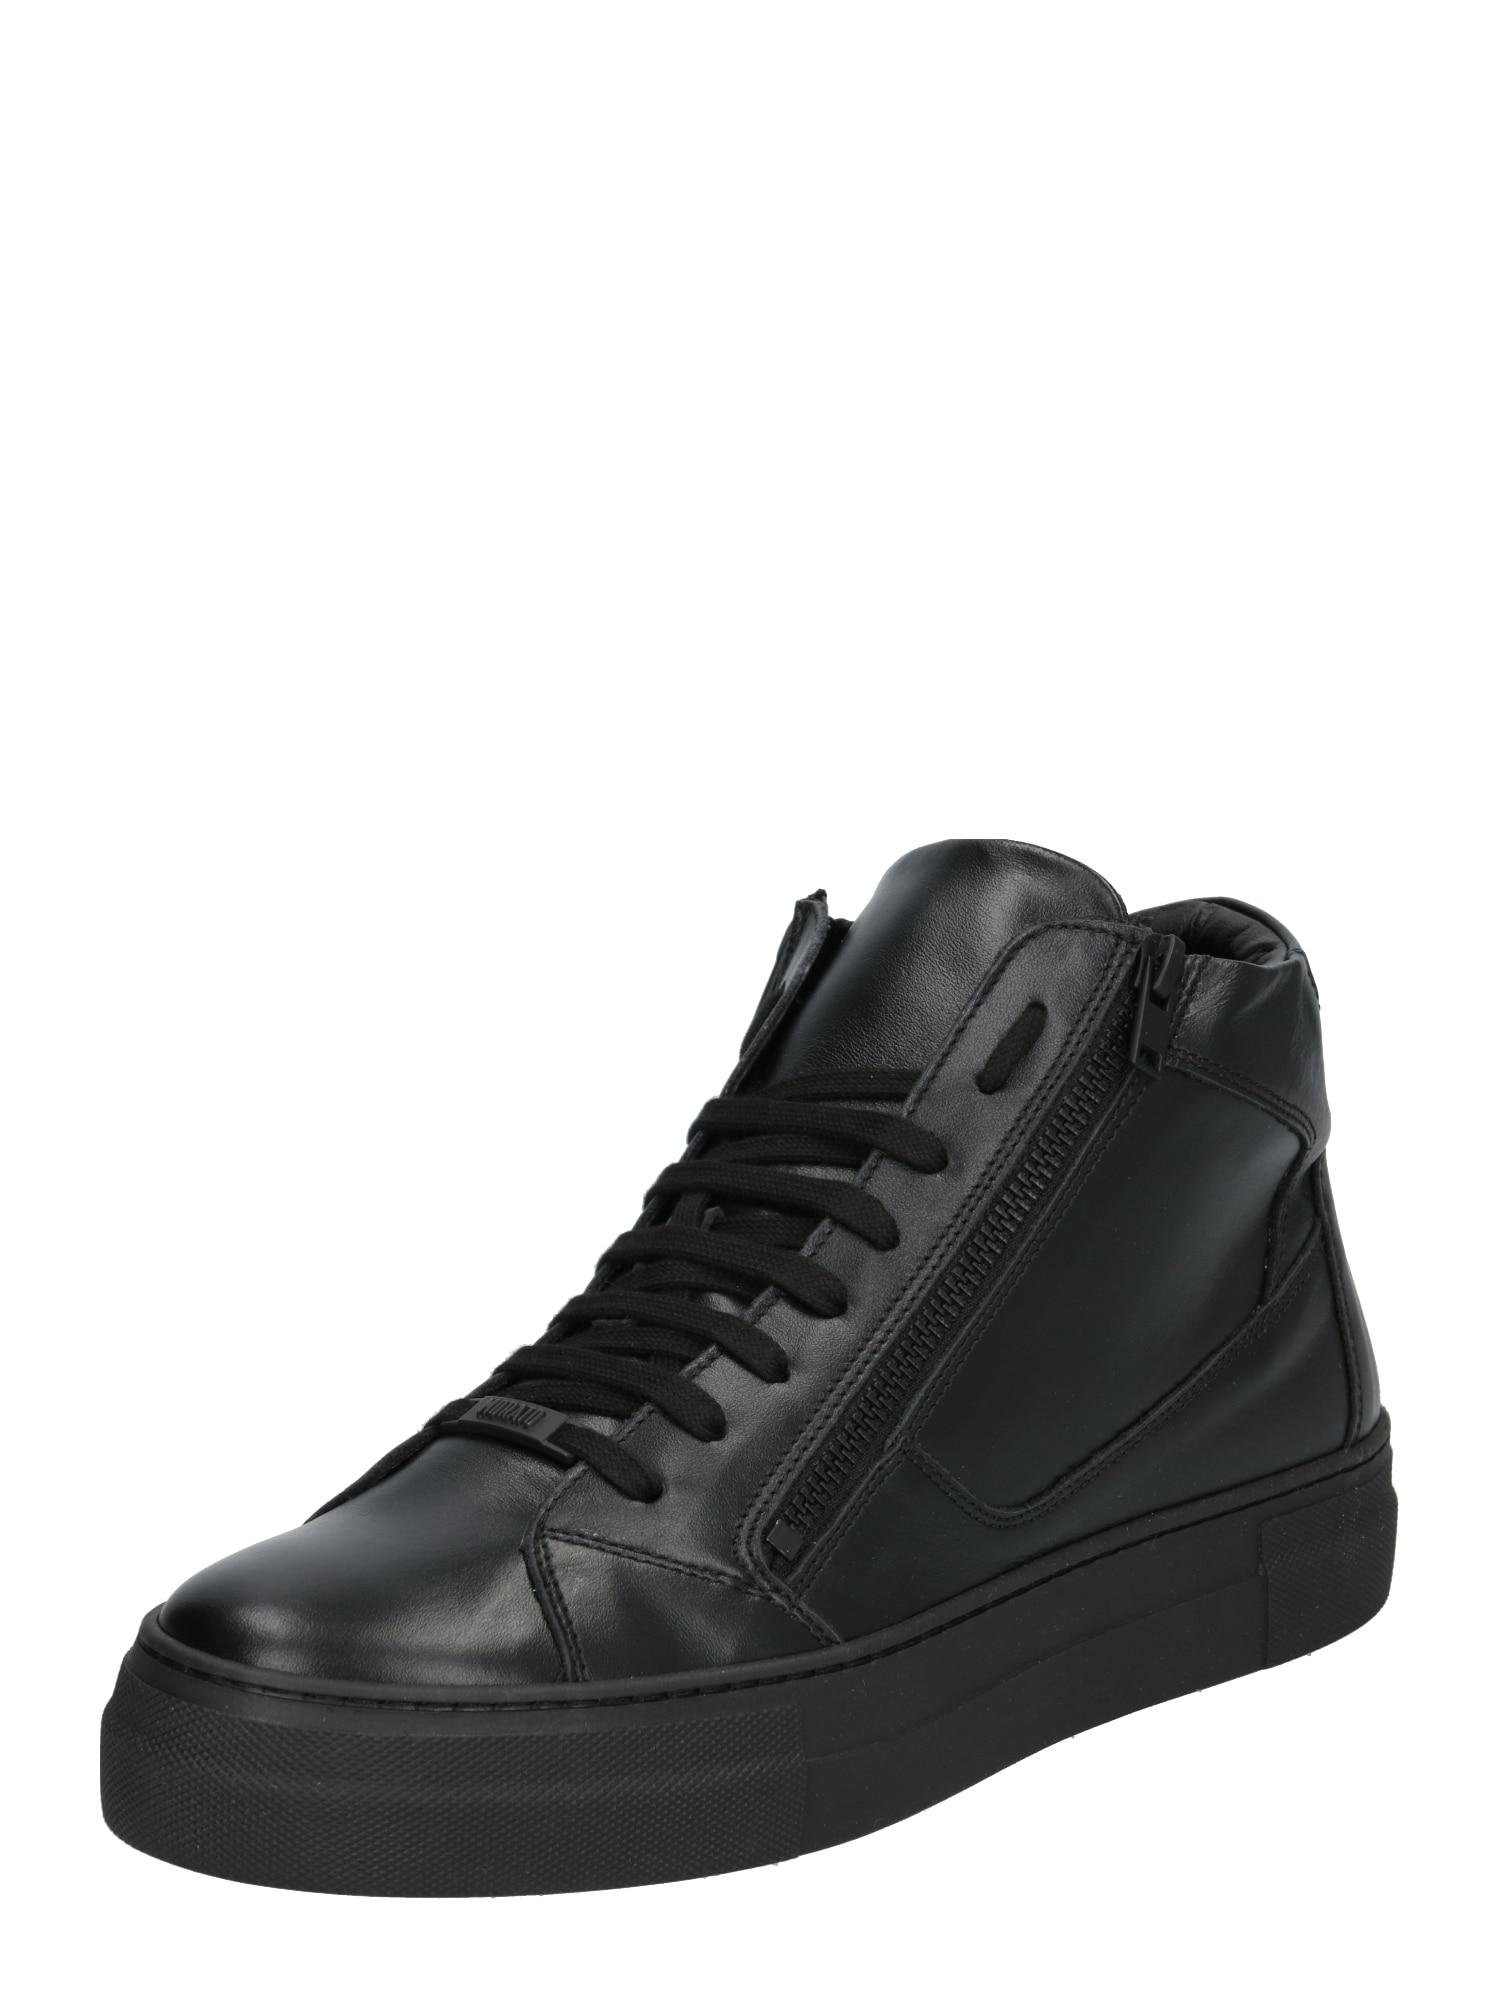 ANTONY MORATO Sneaker înalt  negru